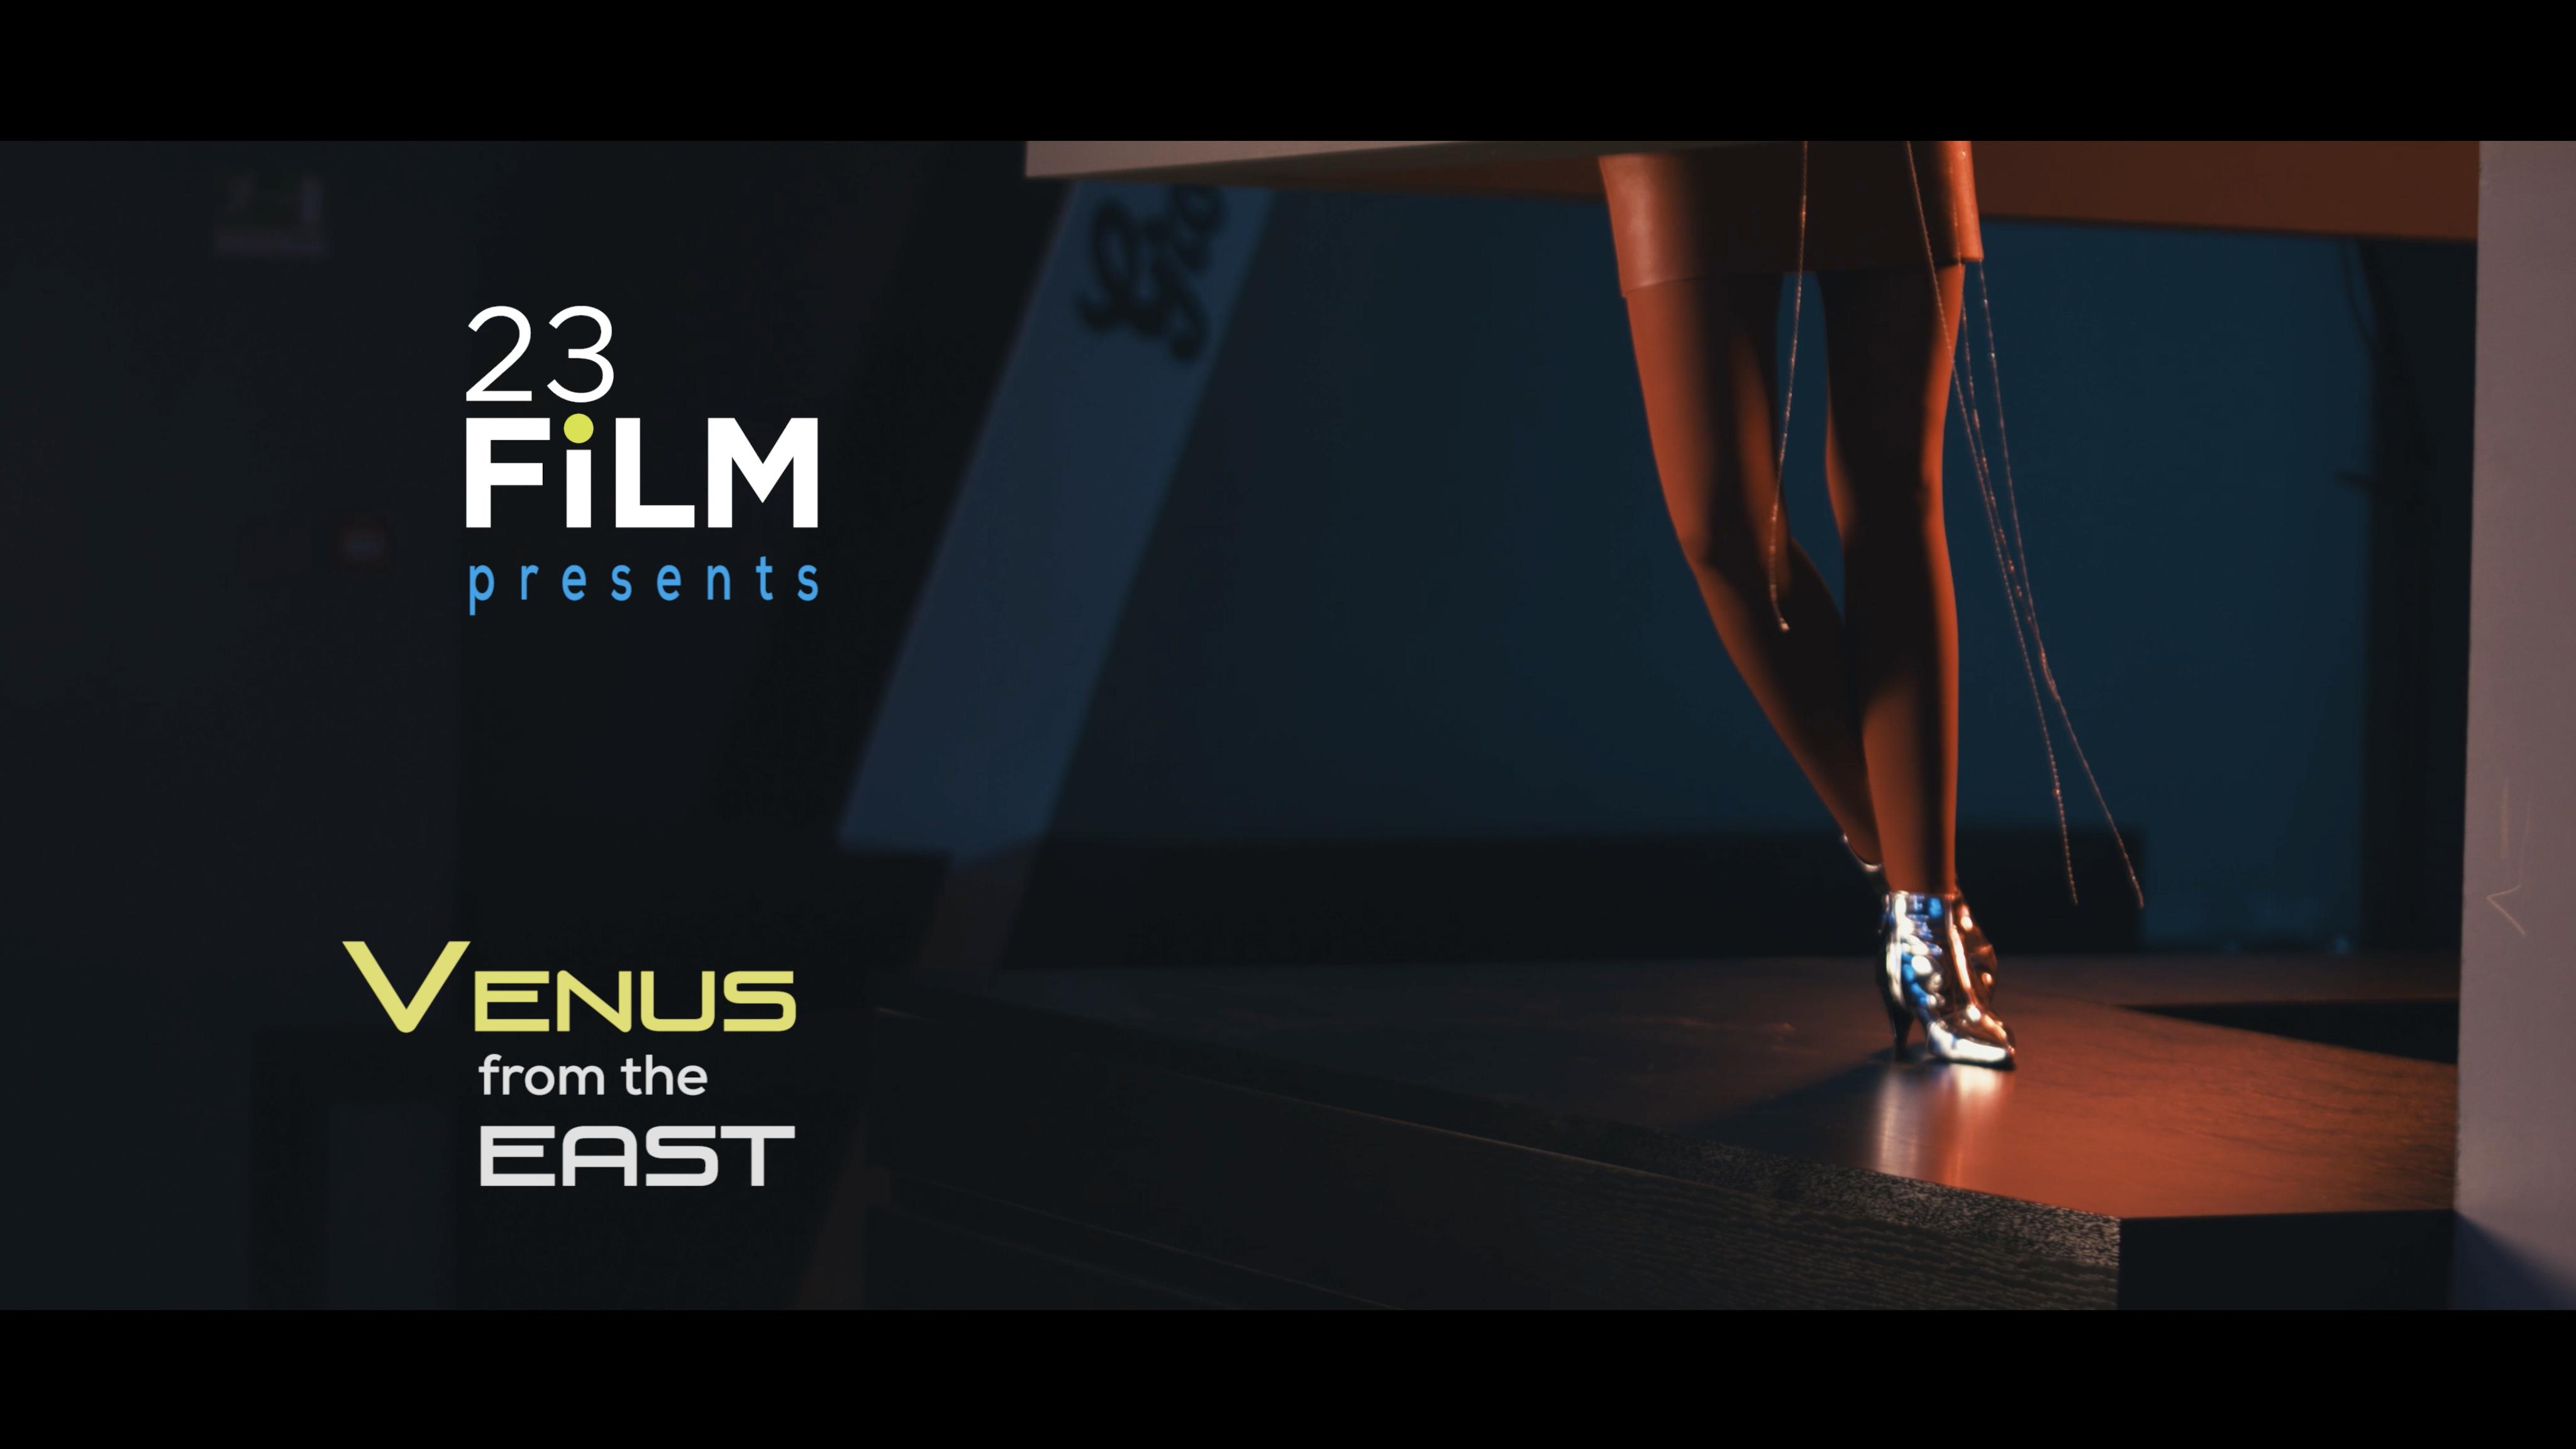 23FILM cluj-napoca commercial cinema art video production project fashion designer conceptual